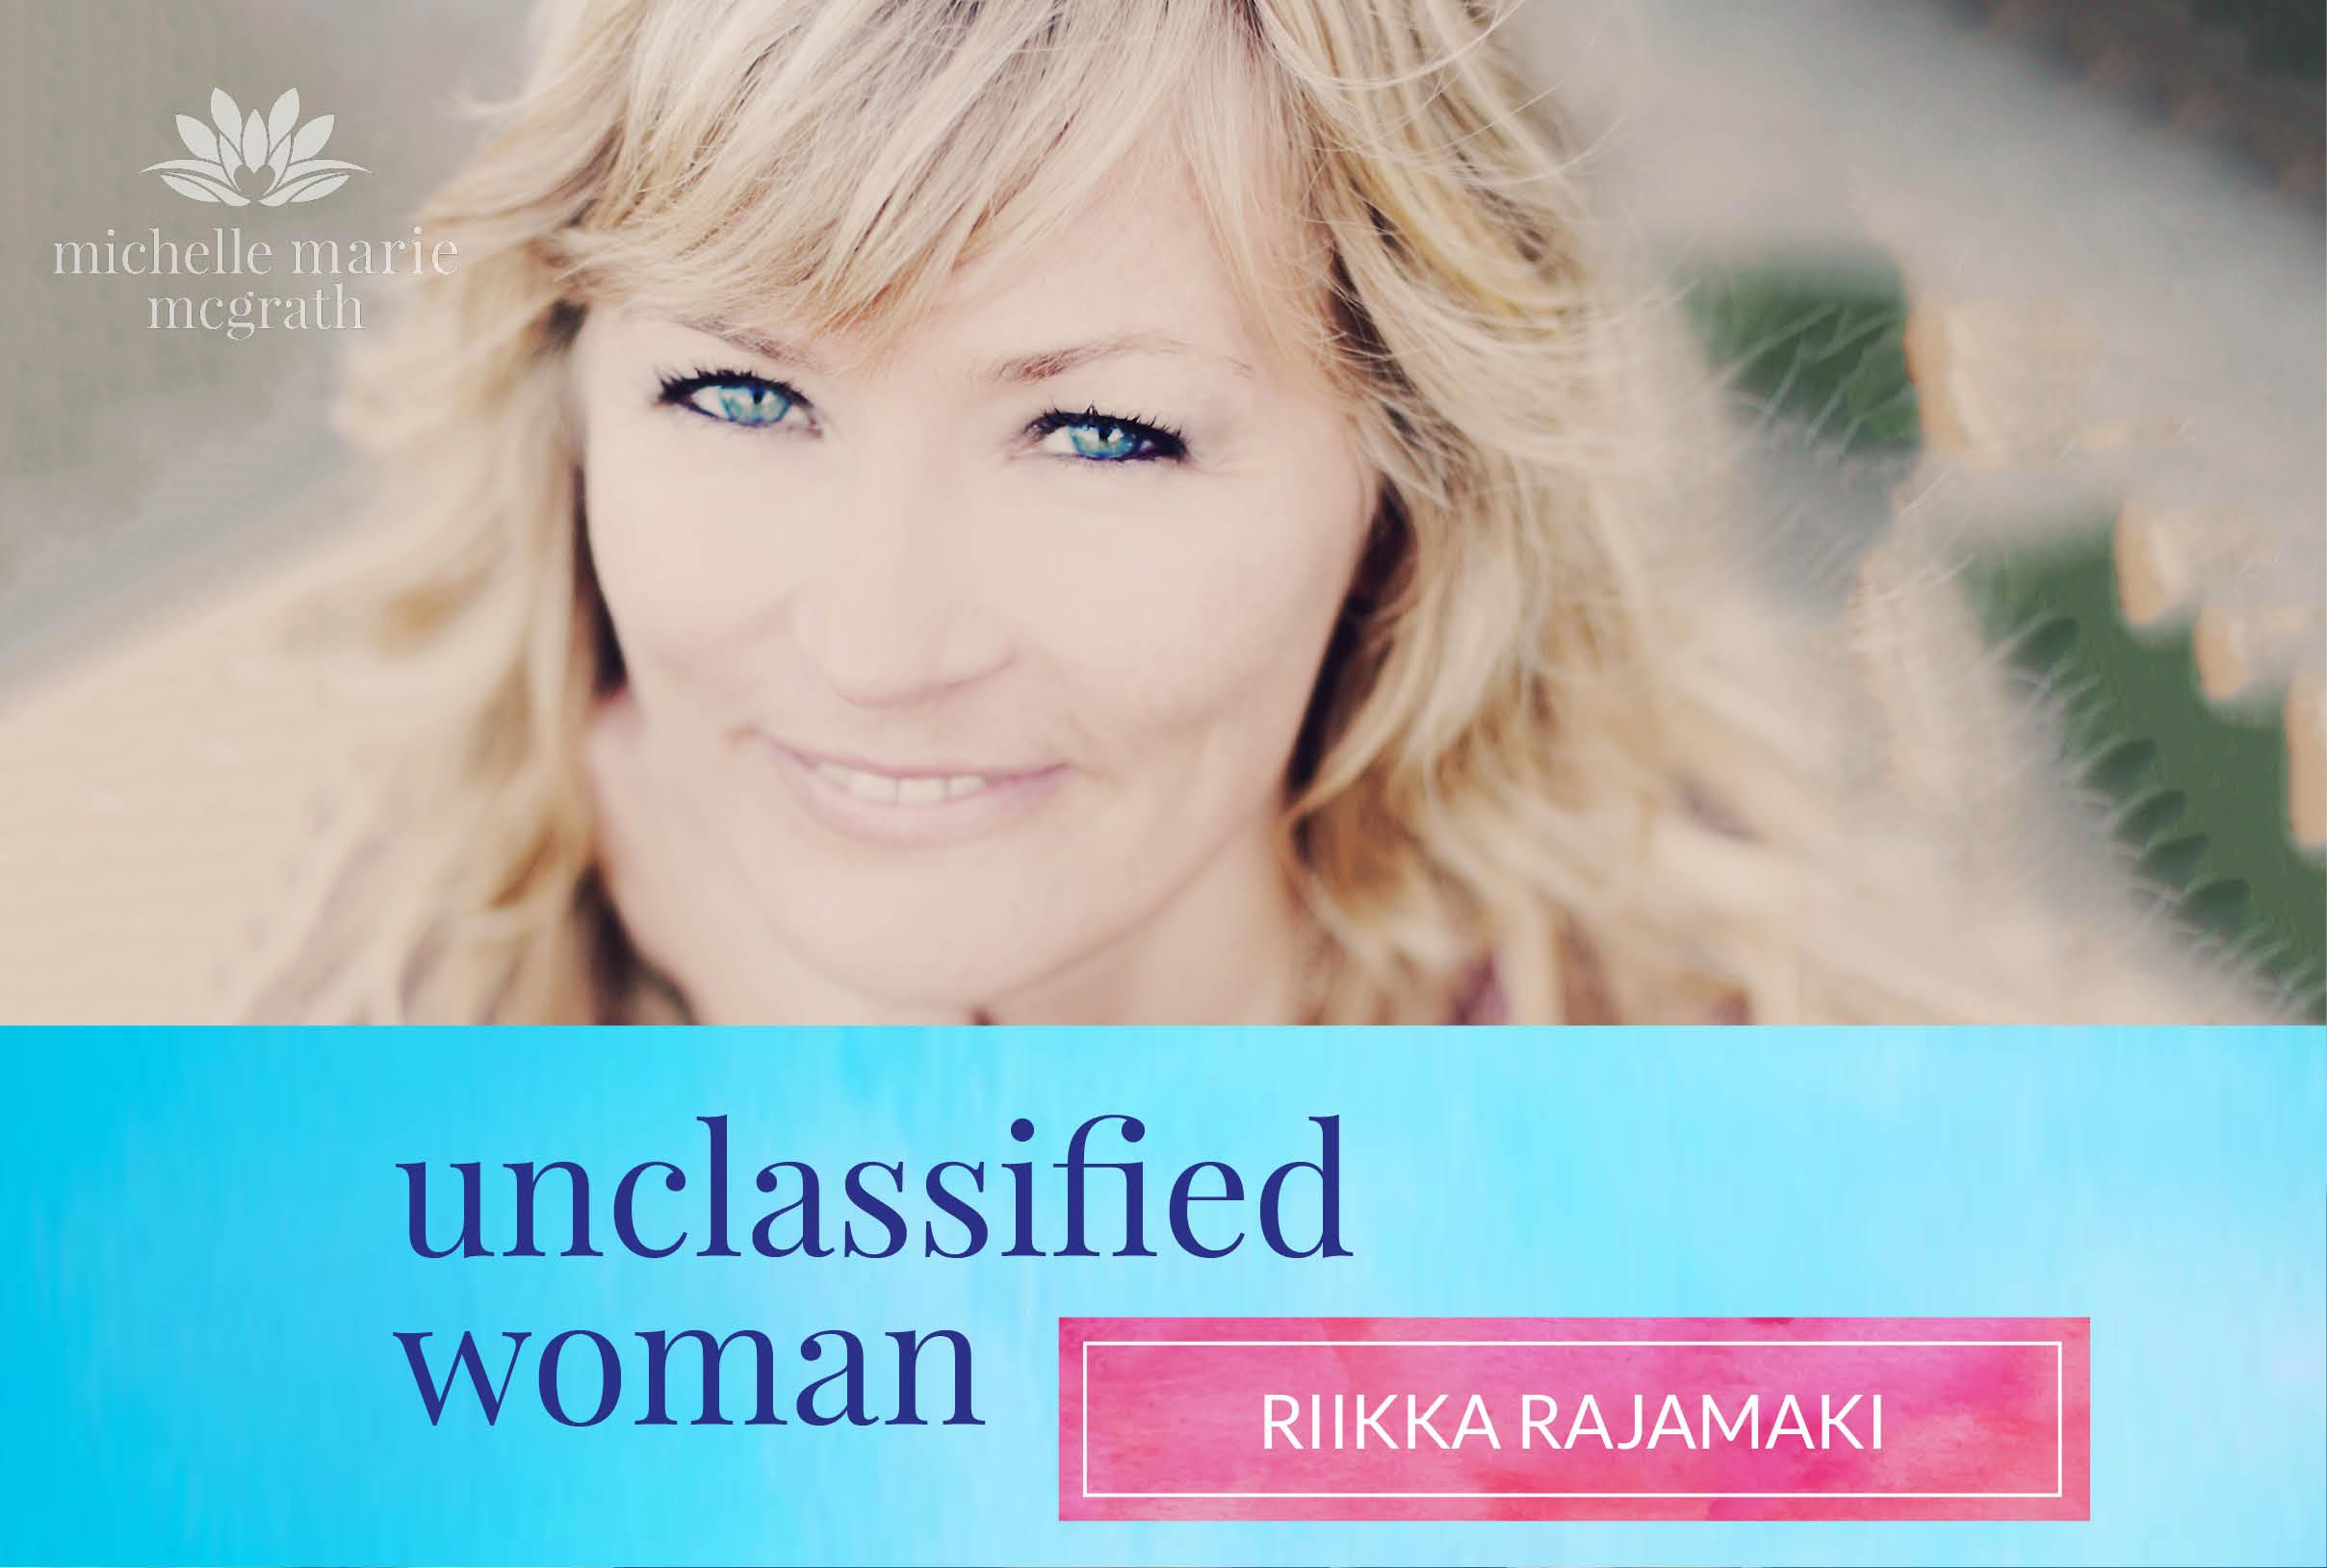 20: A Womb Quest with Riikka Rajamaki